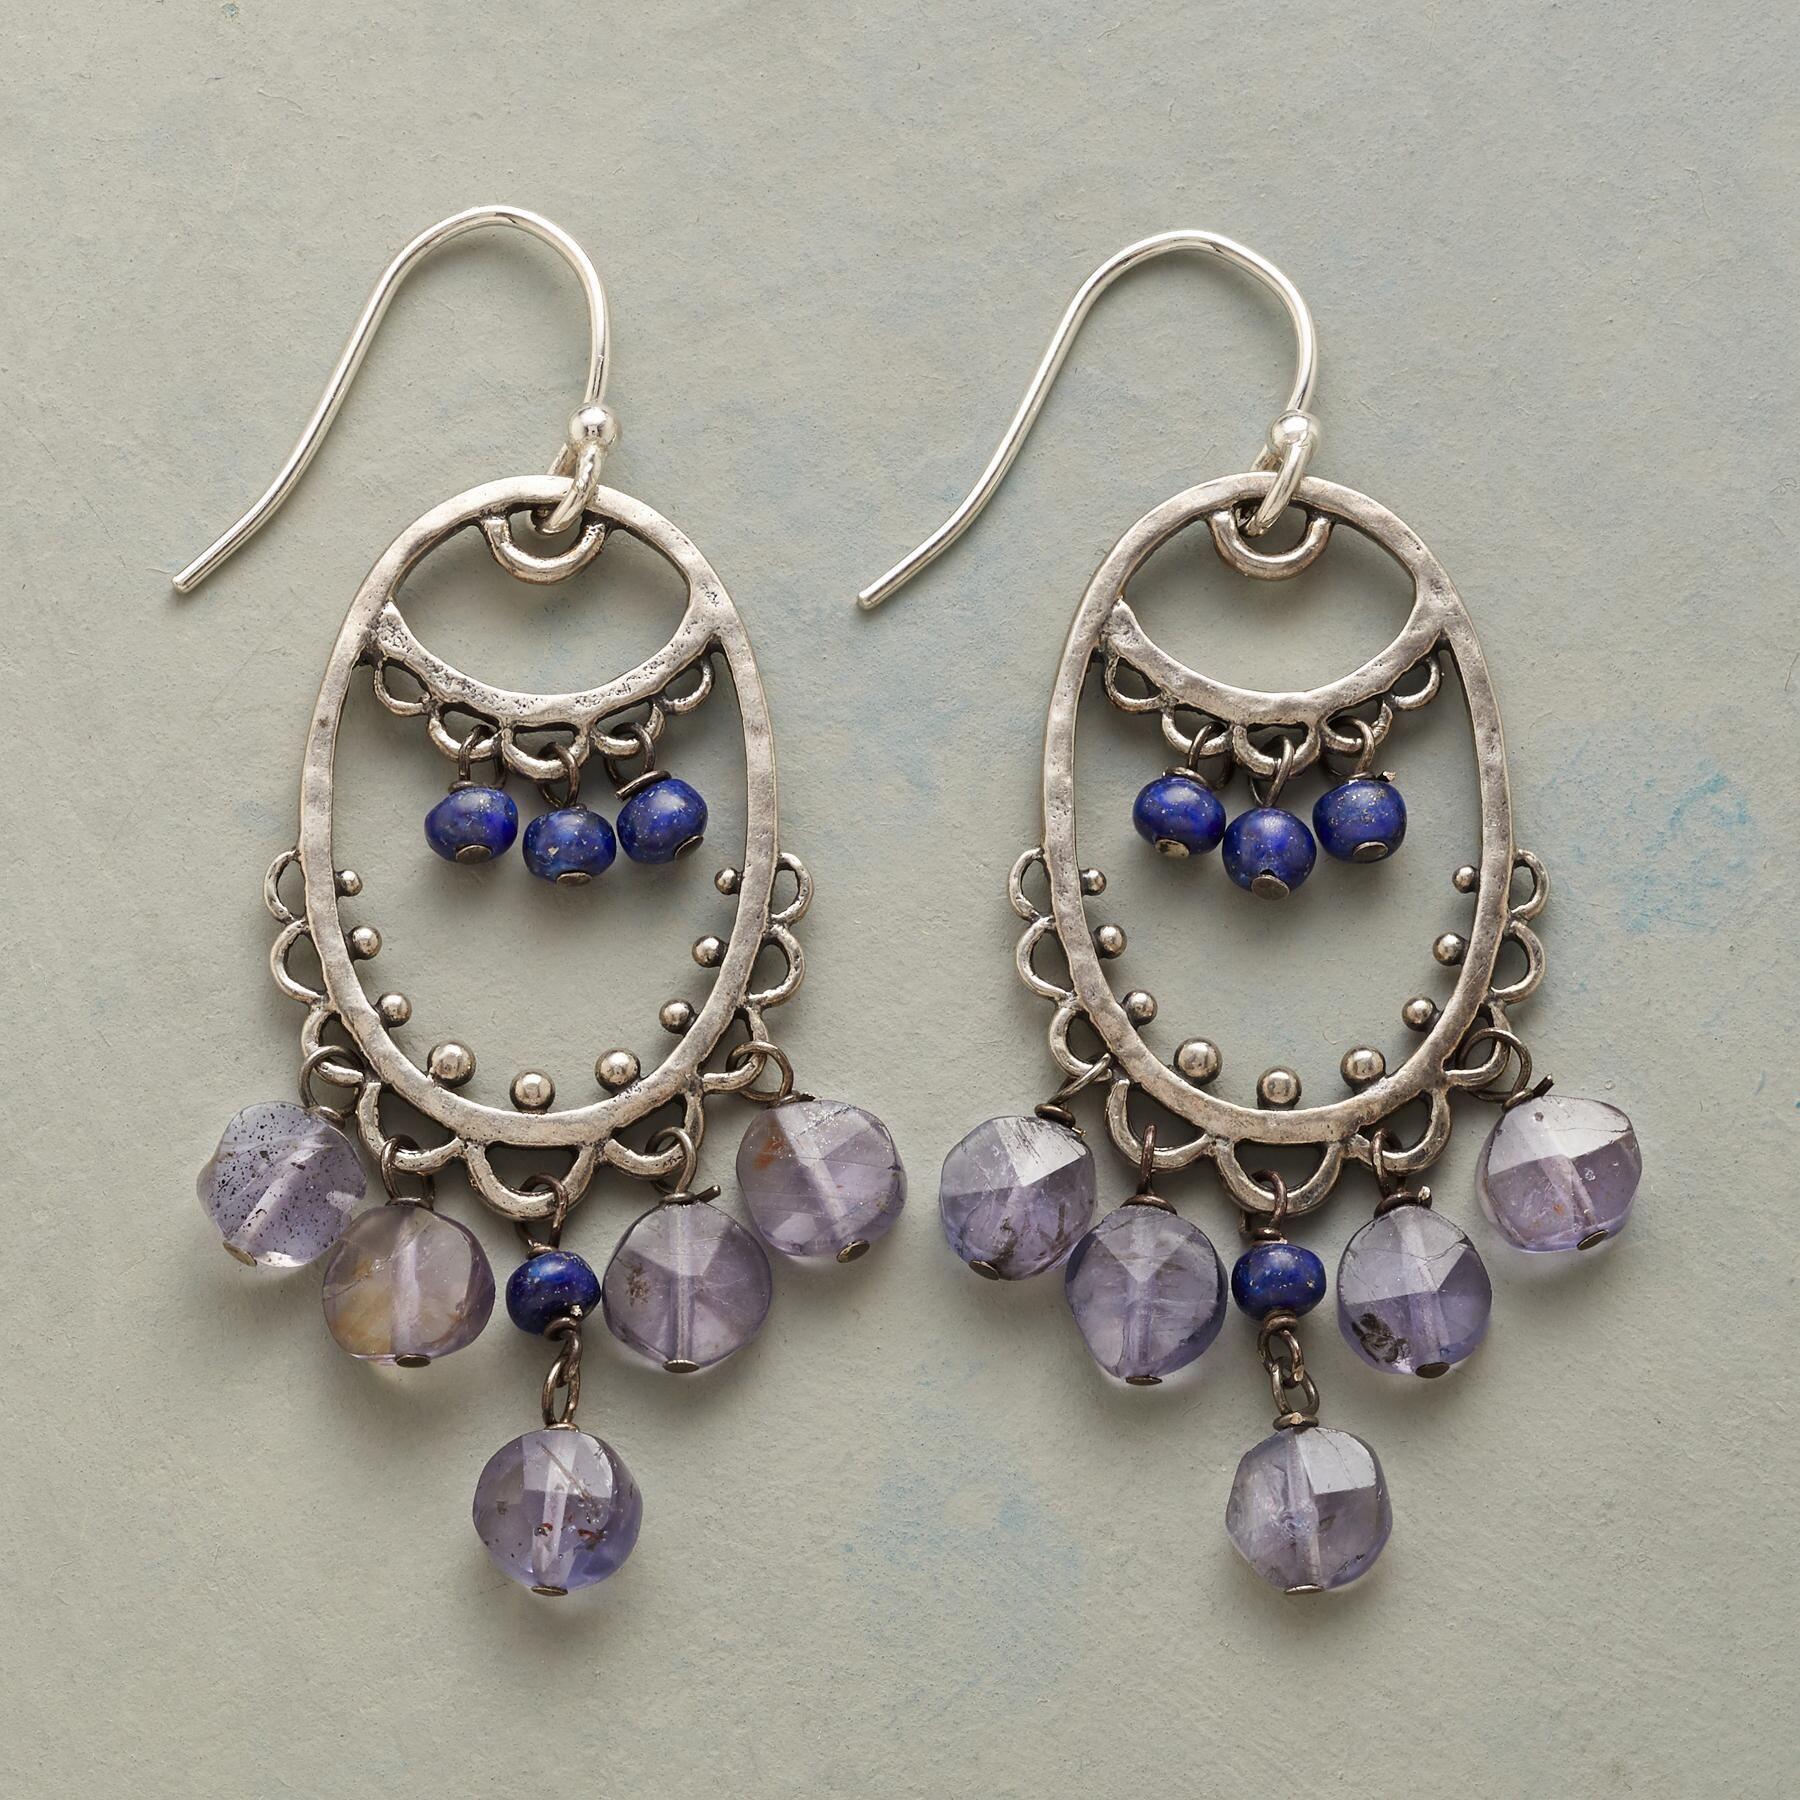 Women Delicate Shells Dangle Hook Piercing Earrings with Colored Beads Decor